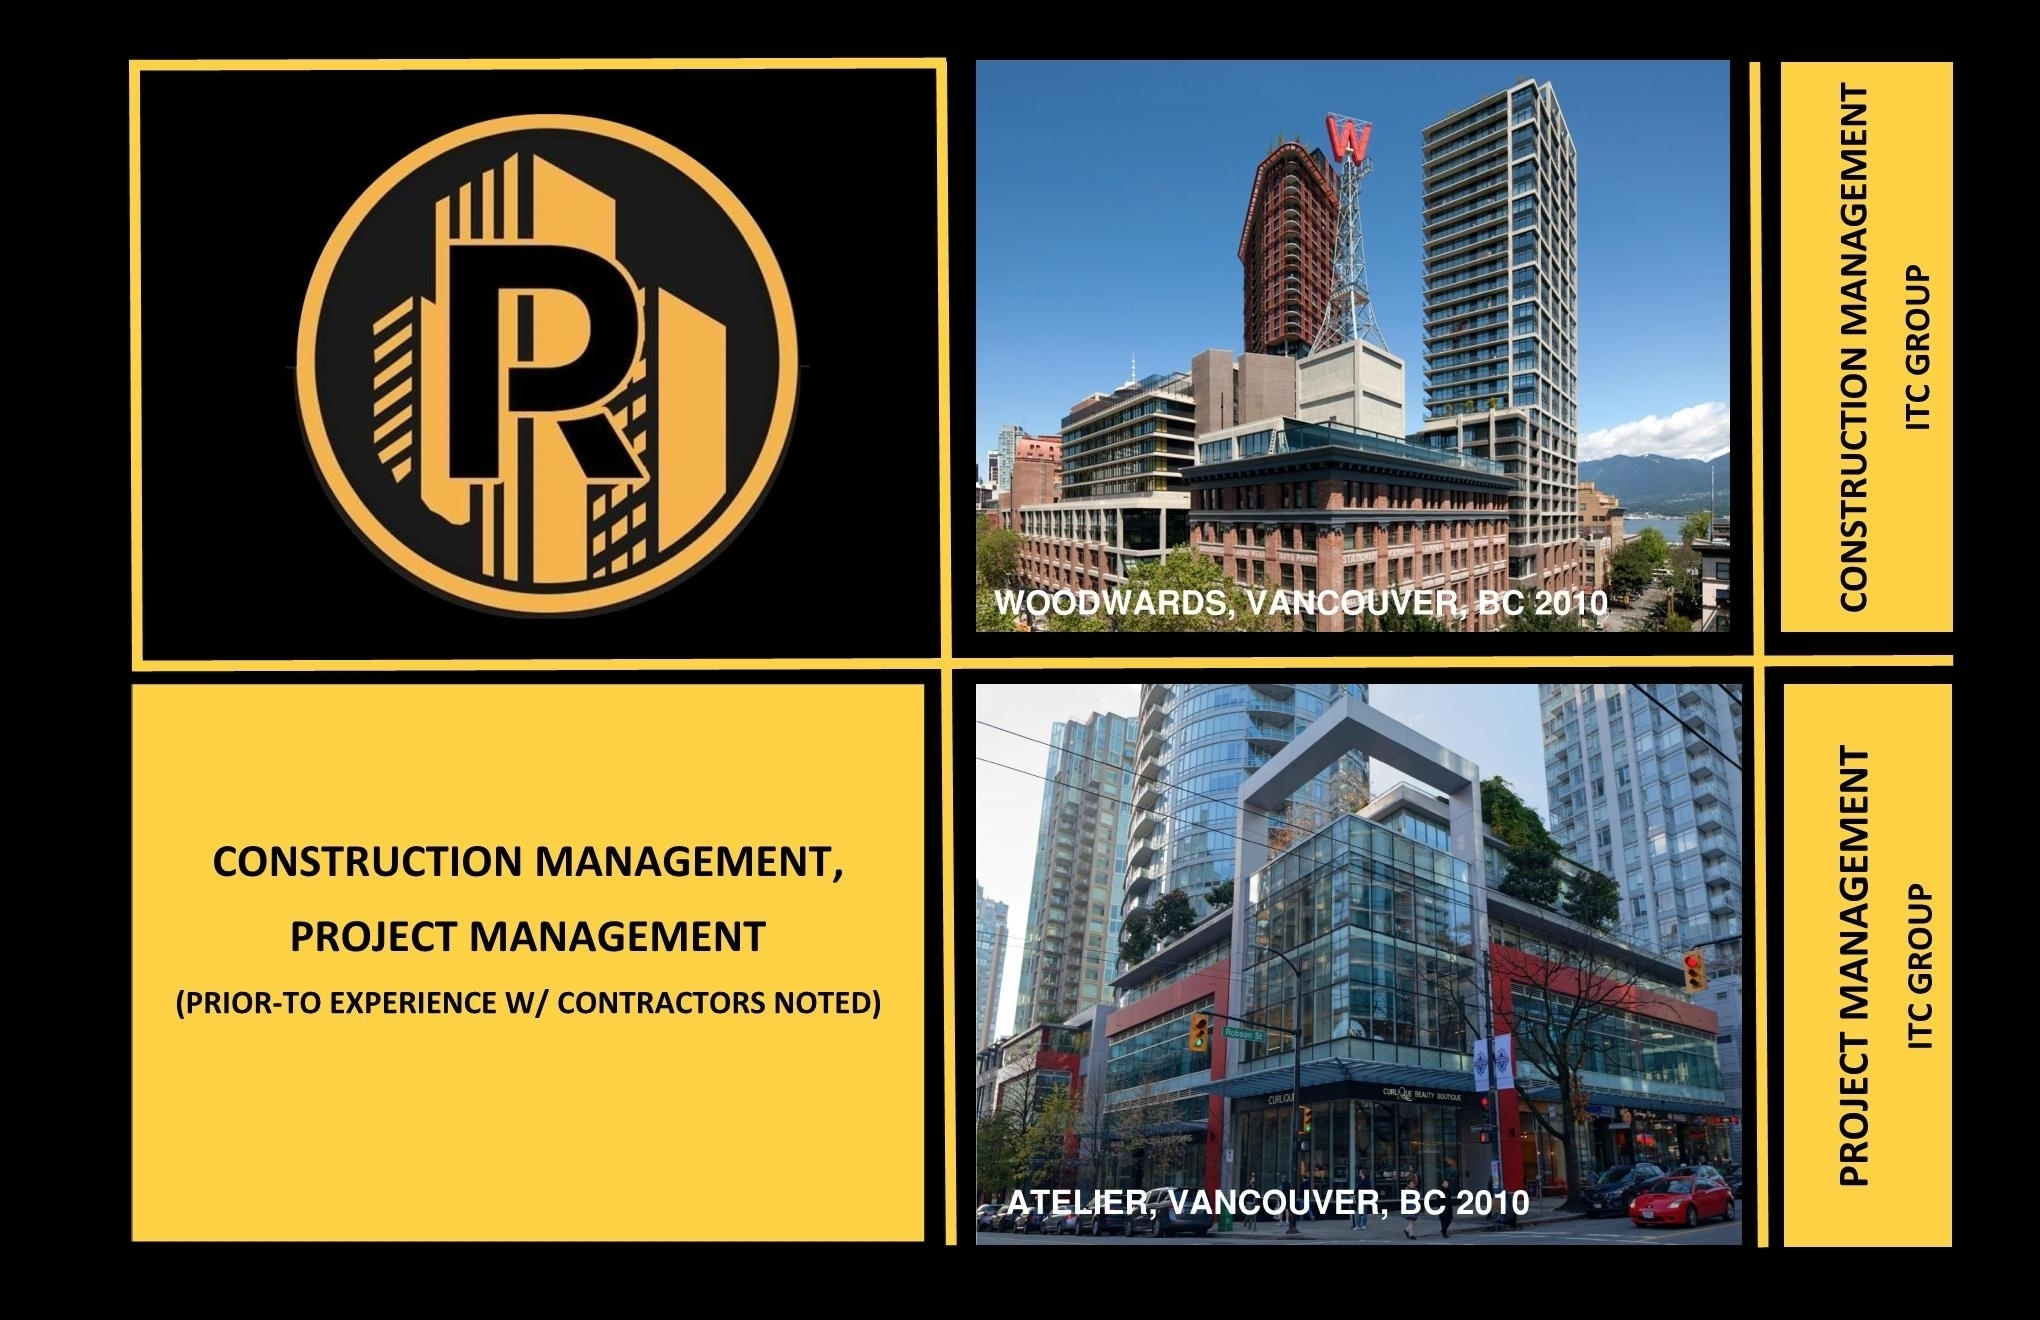 Raudales Enterprise LTD in Vancouver: General Contracting Project Management Construction Management Tenant Improvements Real Estate Development Owner's Representation